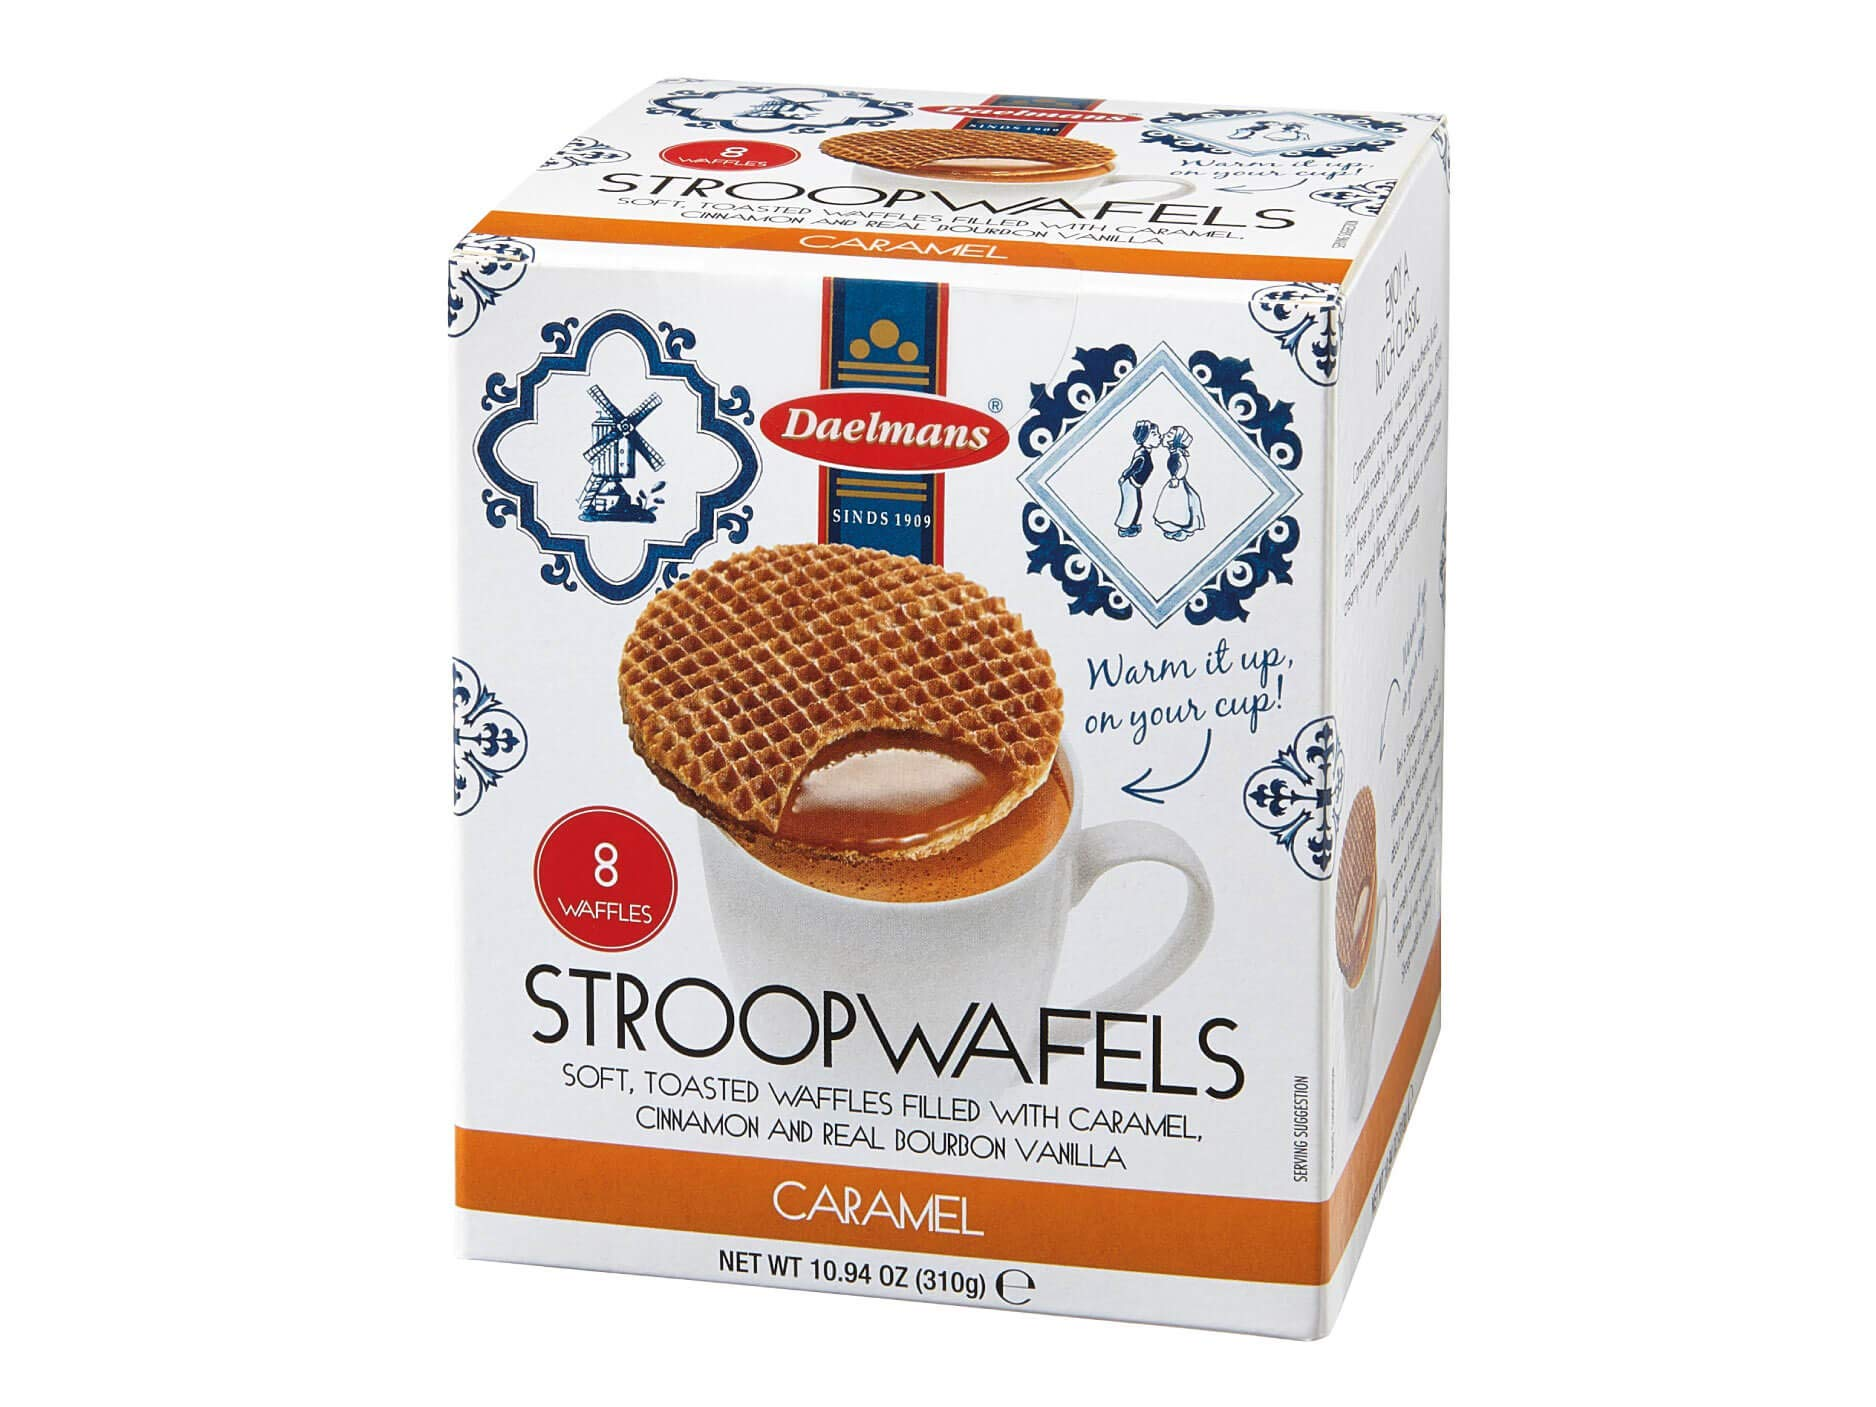 Daelmans Stroopwafel | Caramel Wafers | Syrup Stroopwaffles - 310 g per Cube Box - Dutch Caramel Cookie